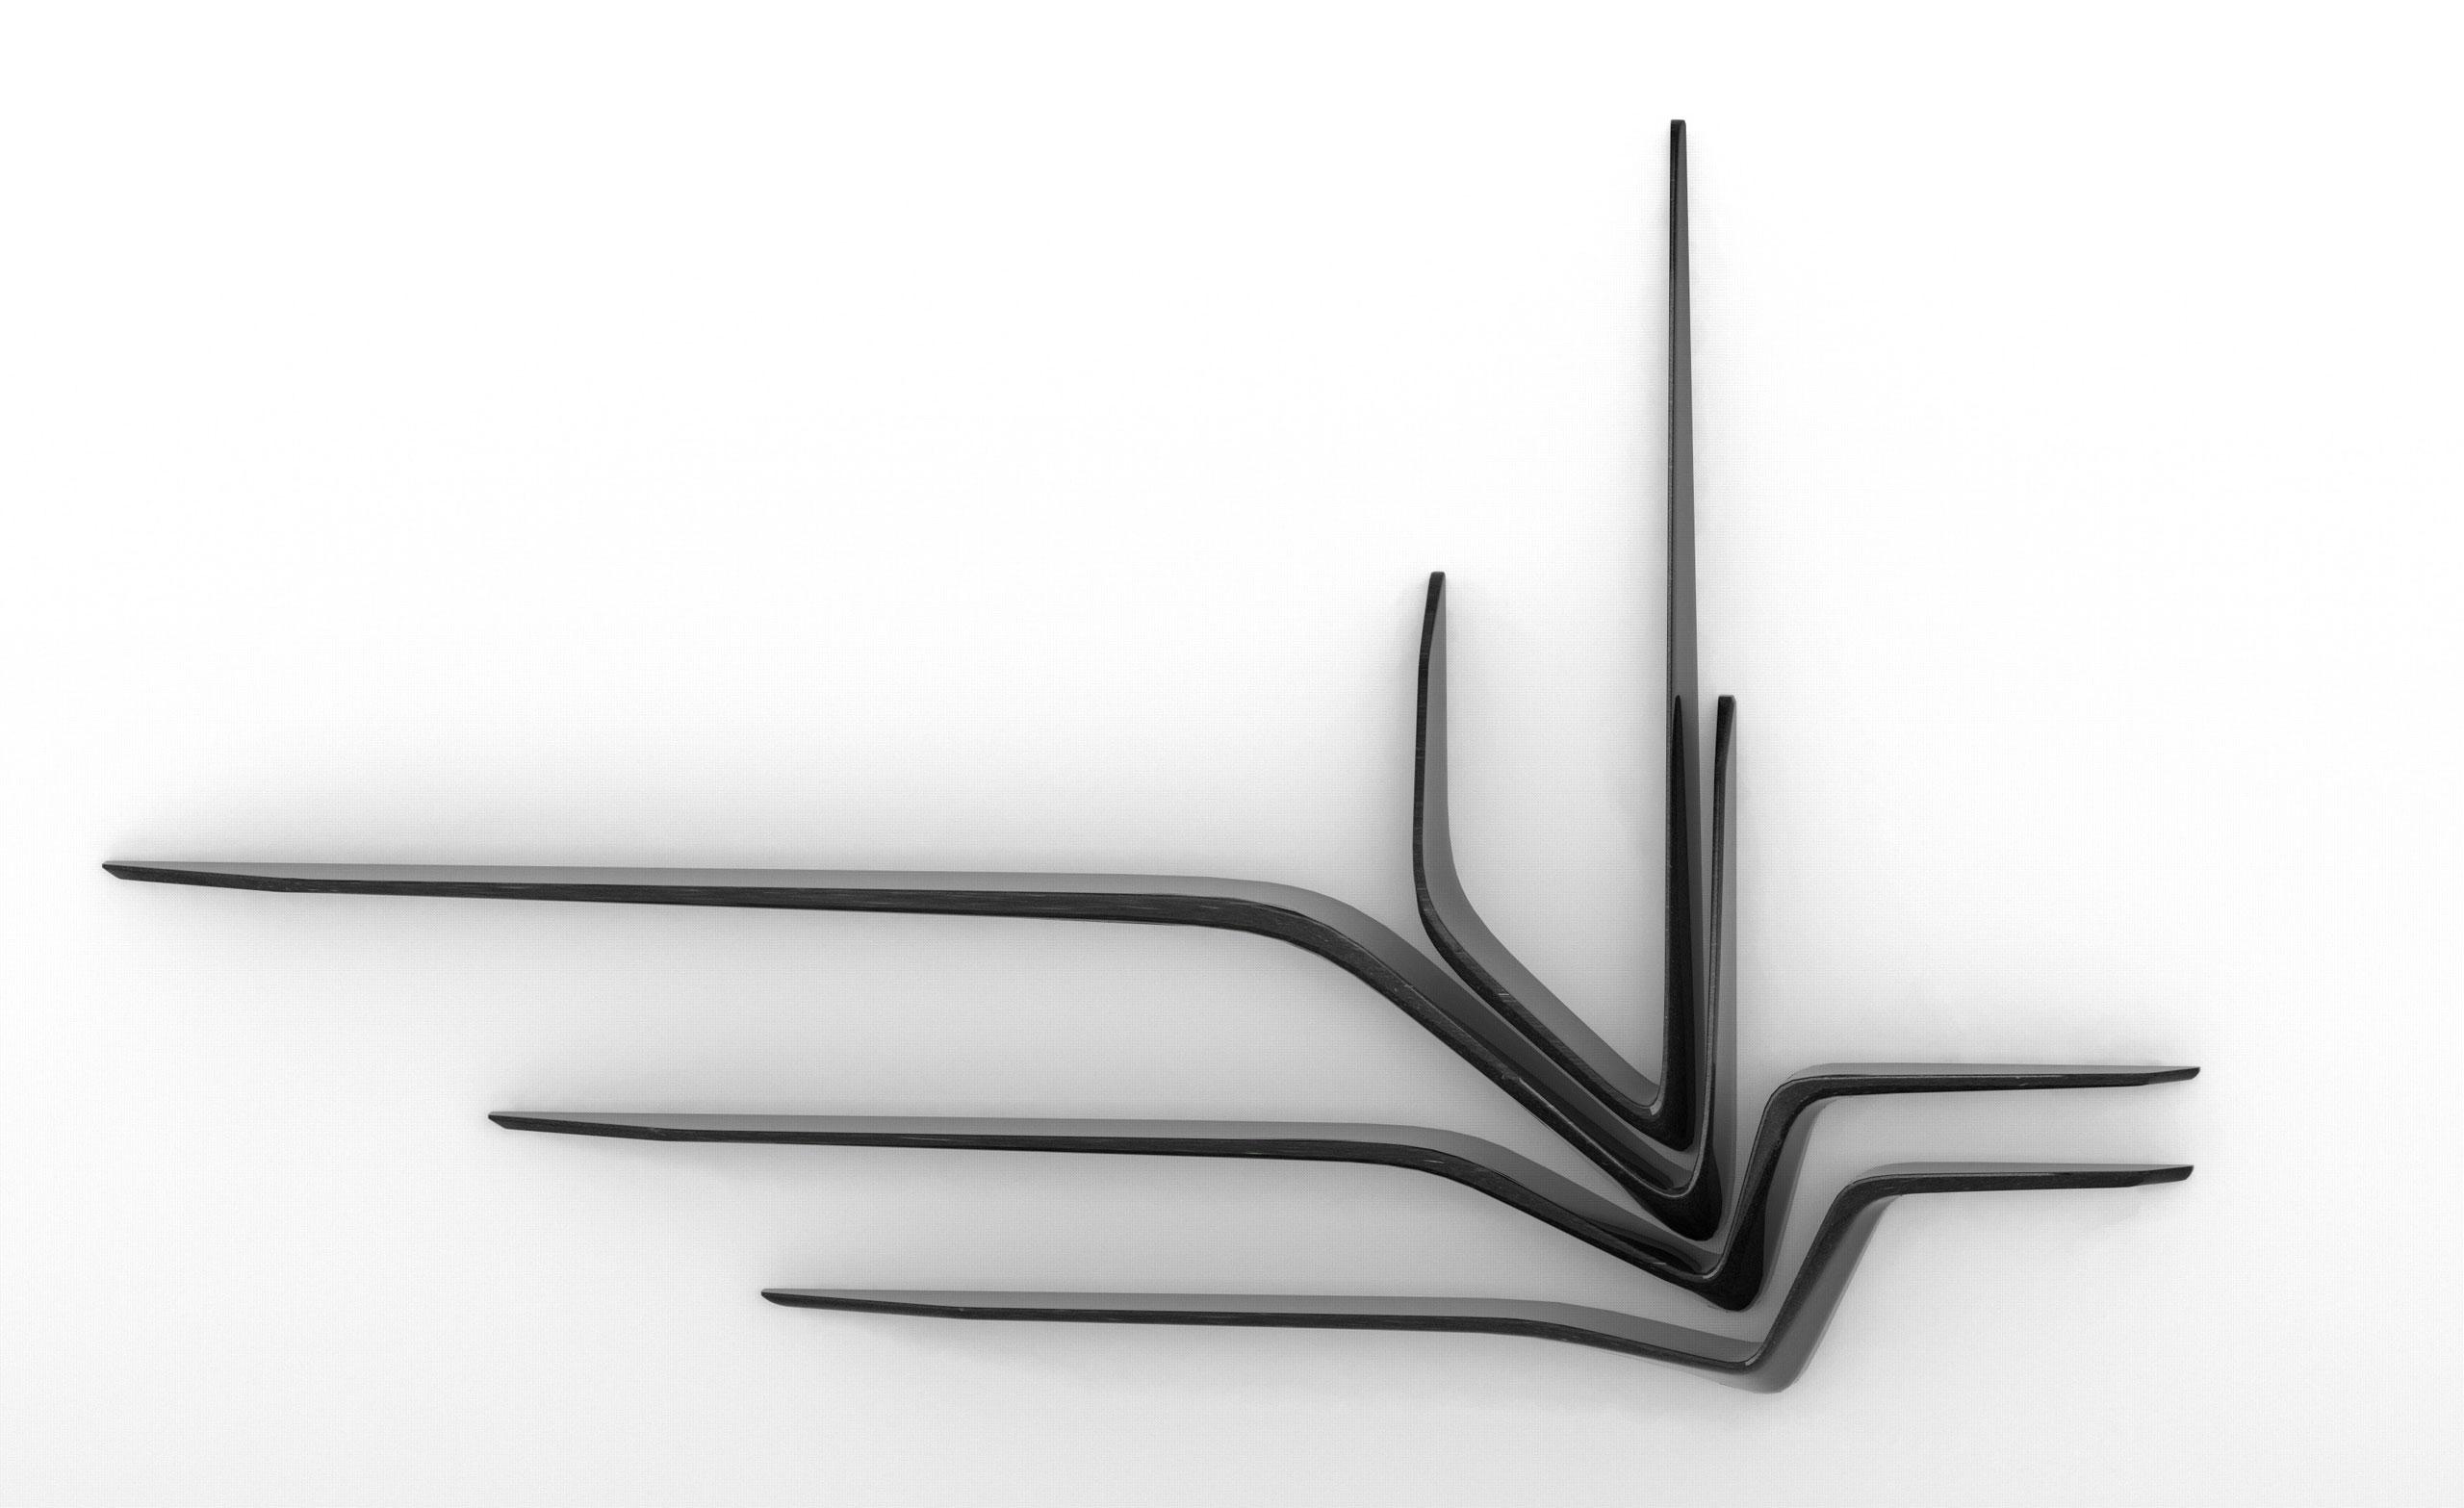 Shelving system by Zaha Hadid Architects for CITCO.